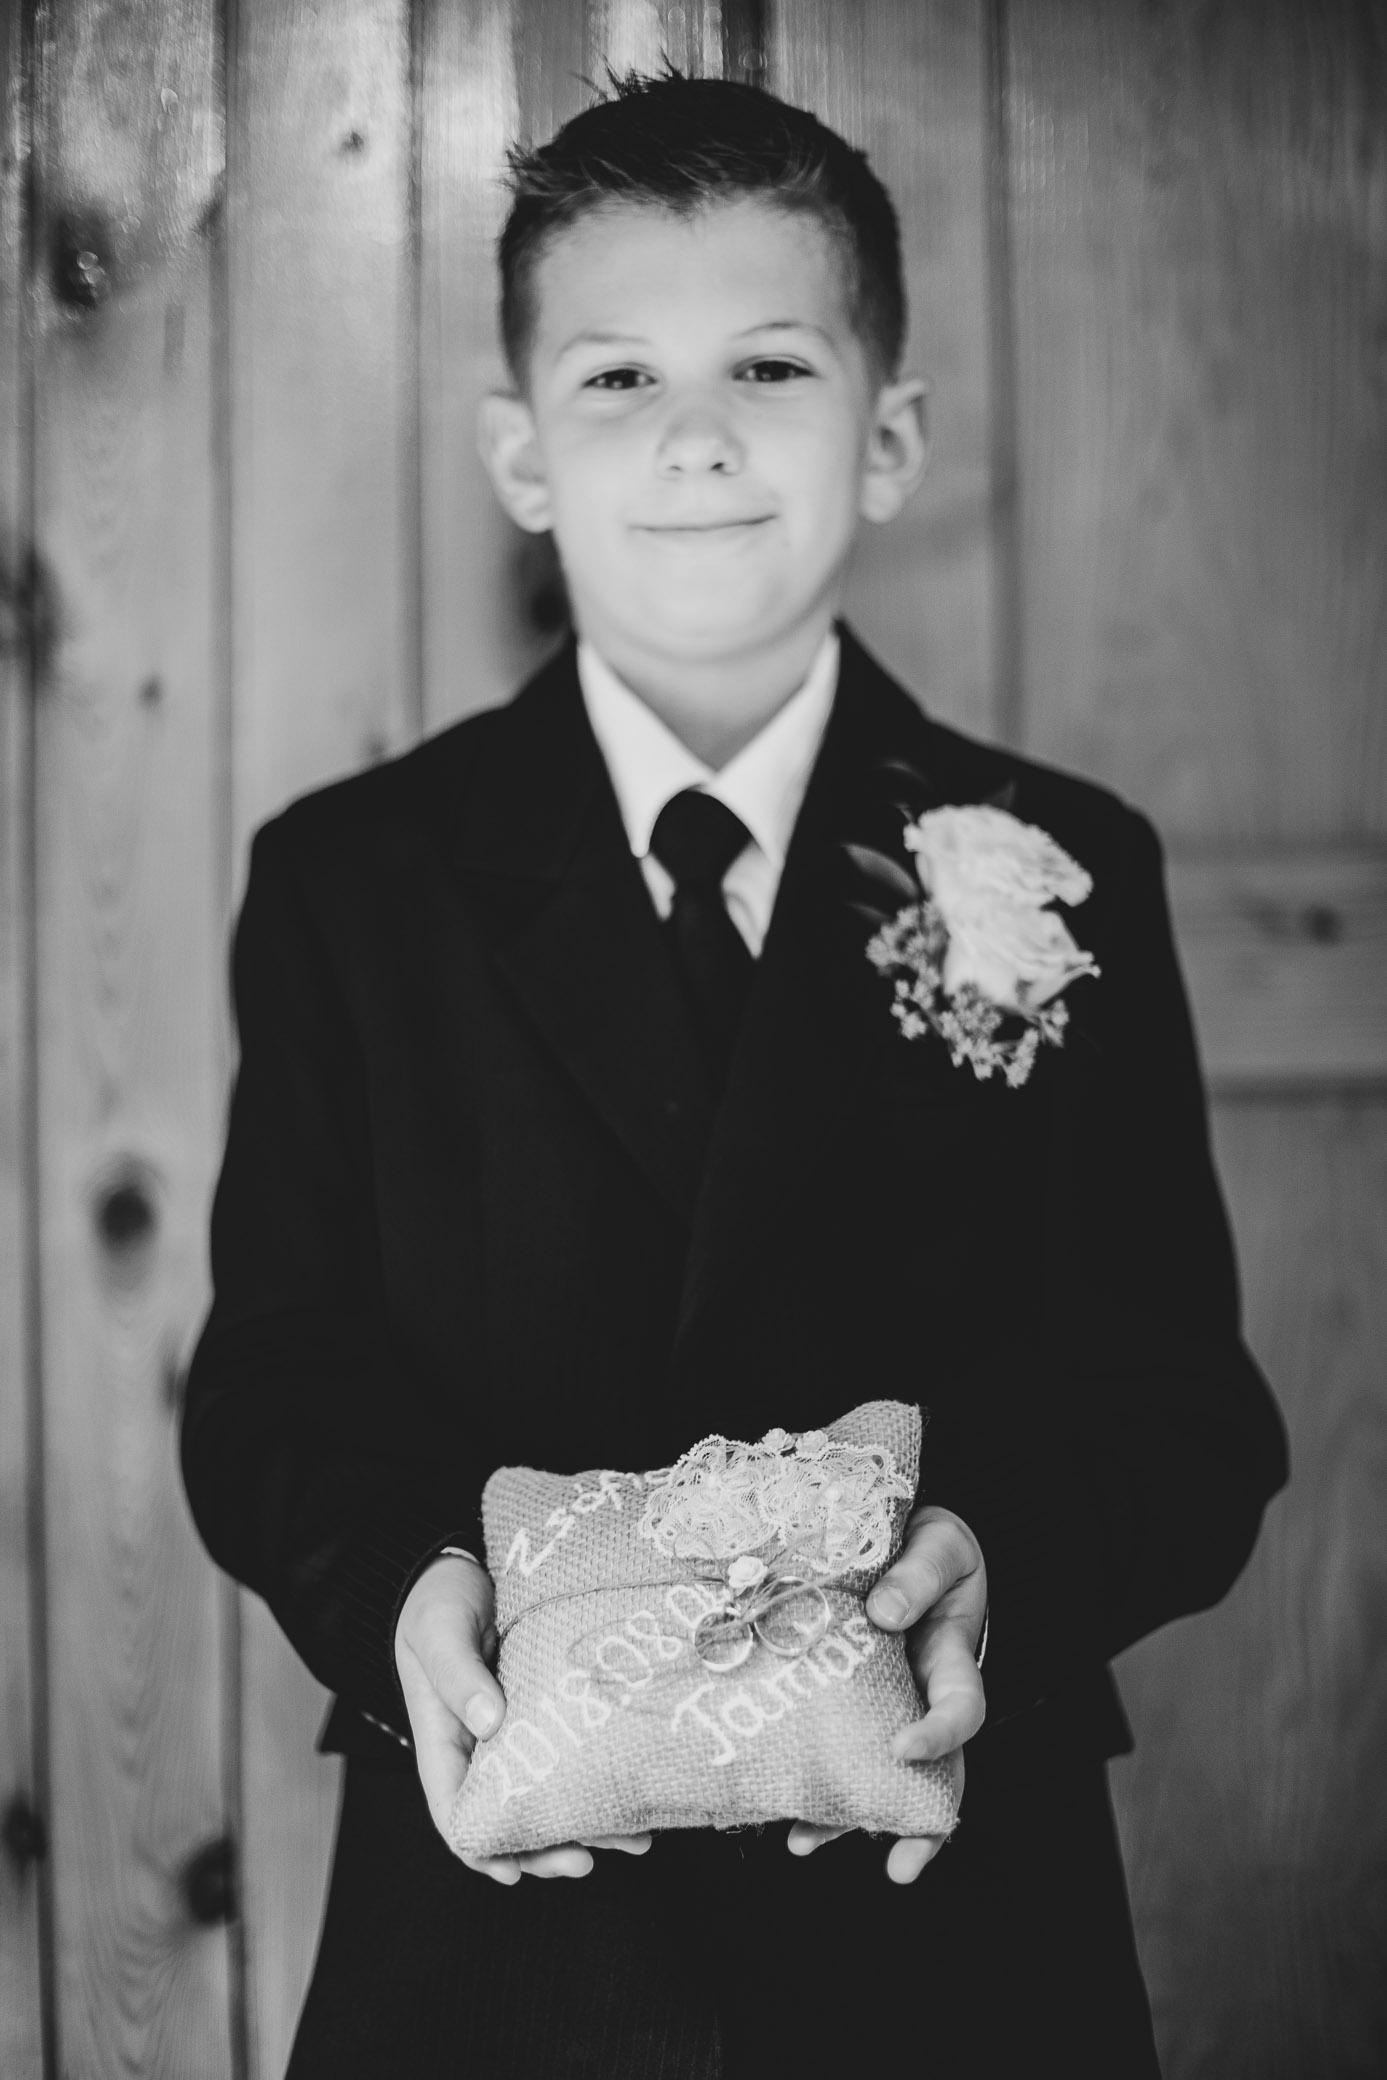 ring holder portrait of boy